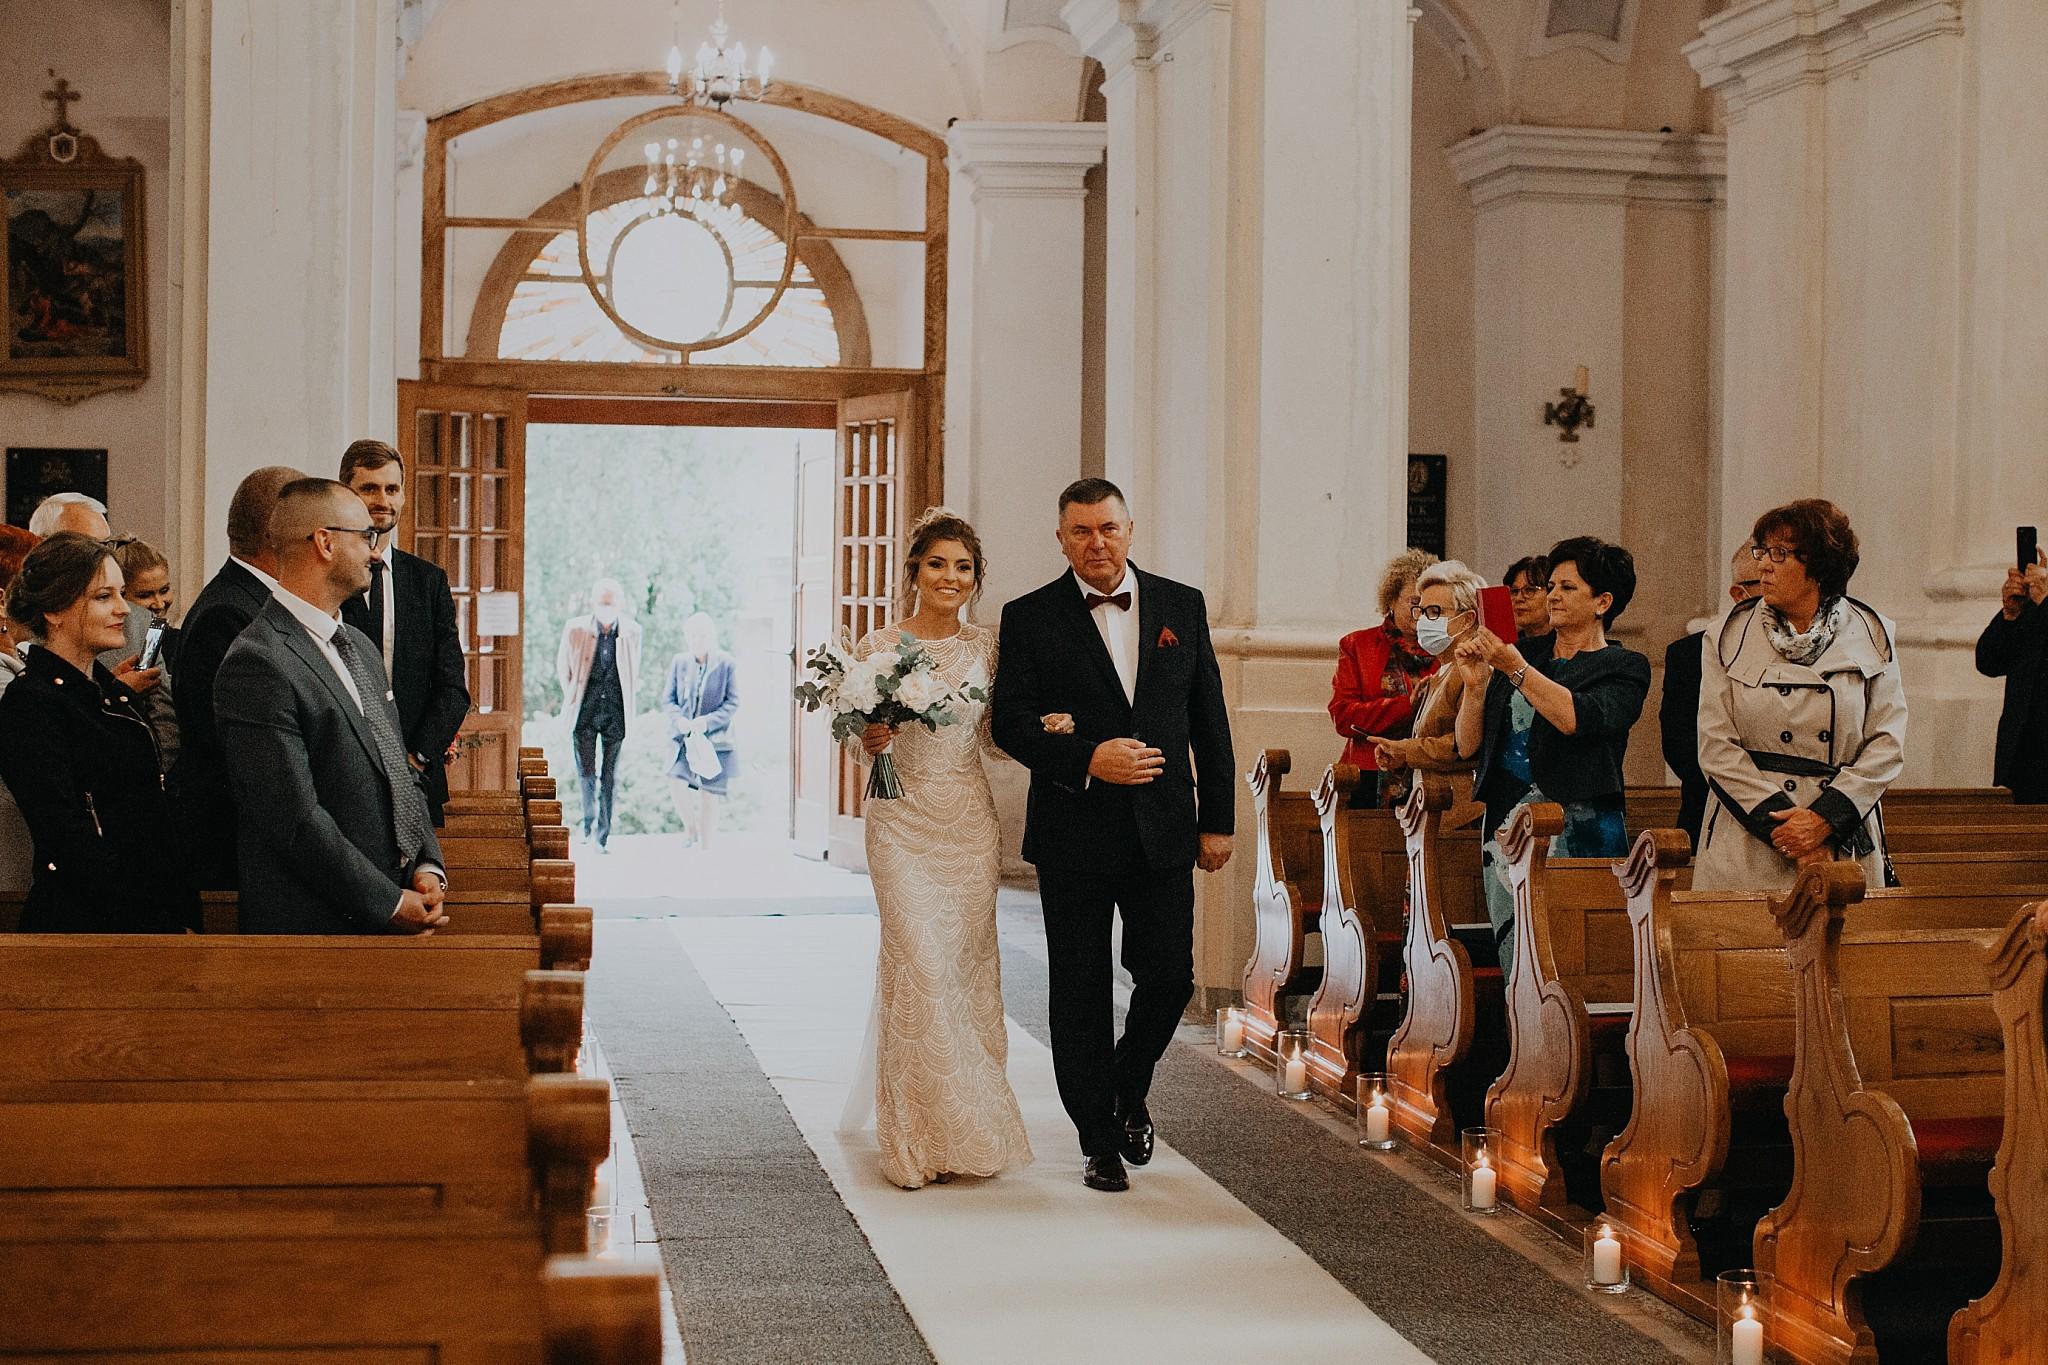 fotograf poznan wesele dobra truskawka piekne wesele pod poznaniem wesele w dobrej truskawce piekna para mloda slub marzen slub koronawirus slub listopad wesele koronawirus 150